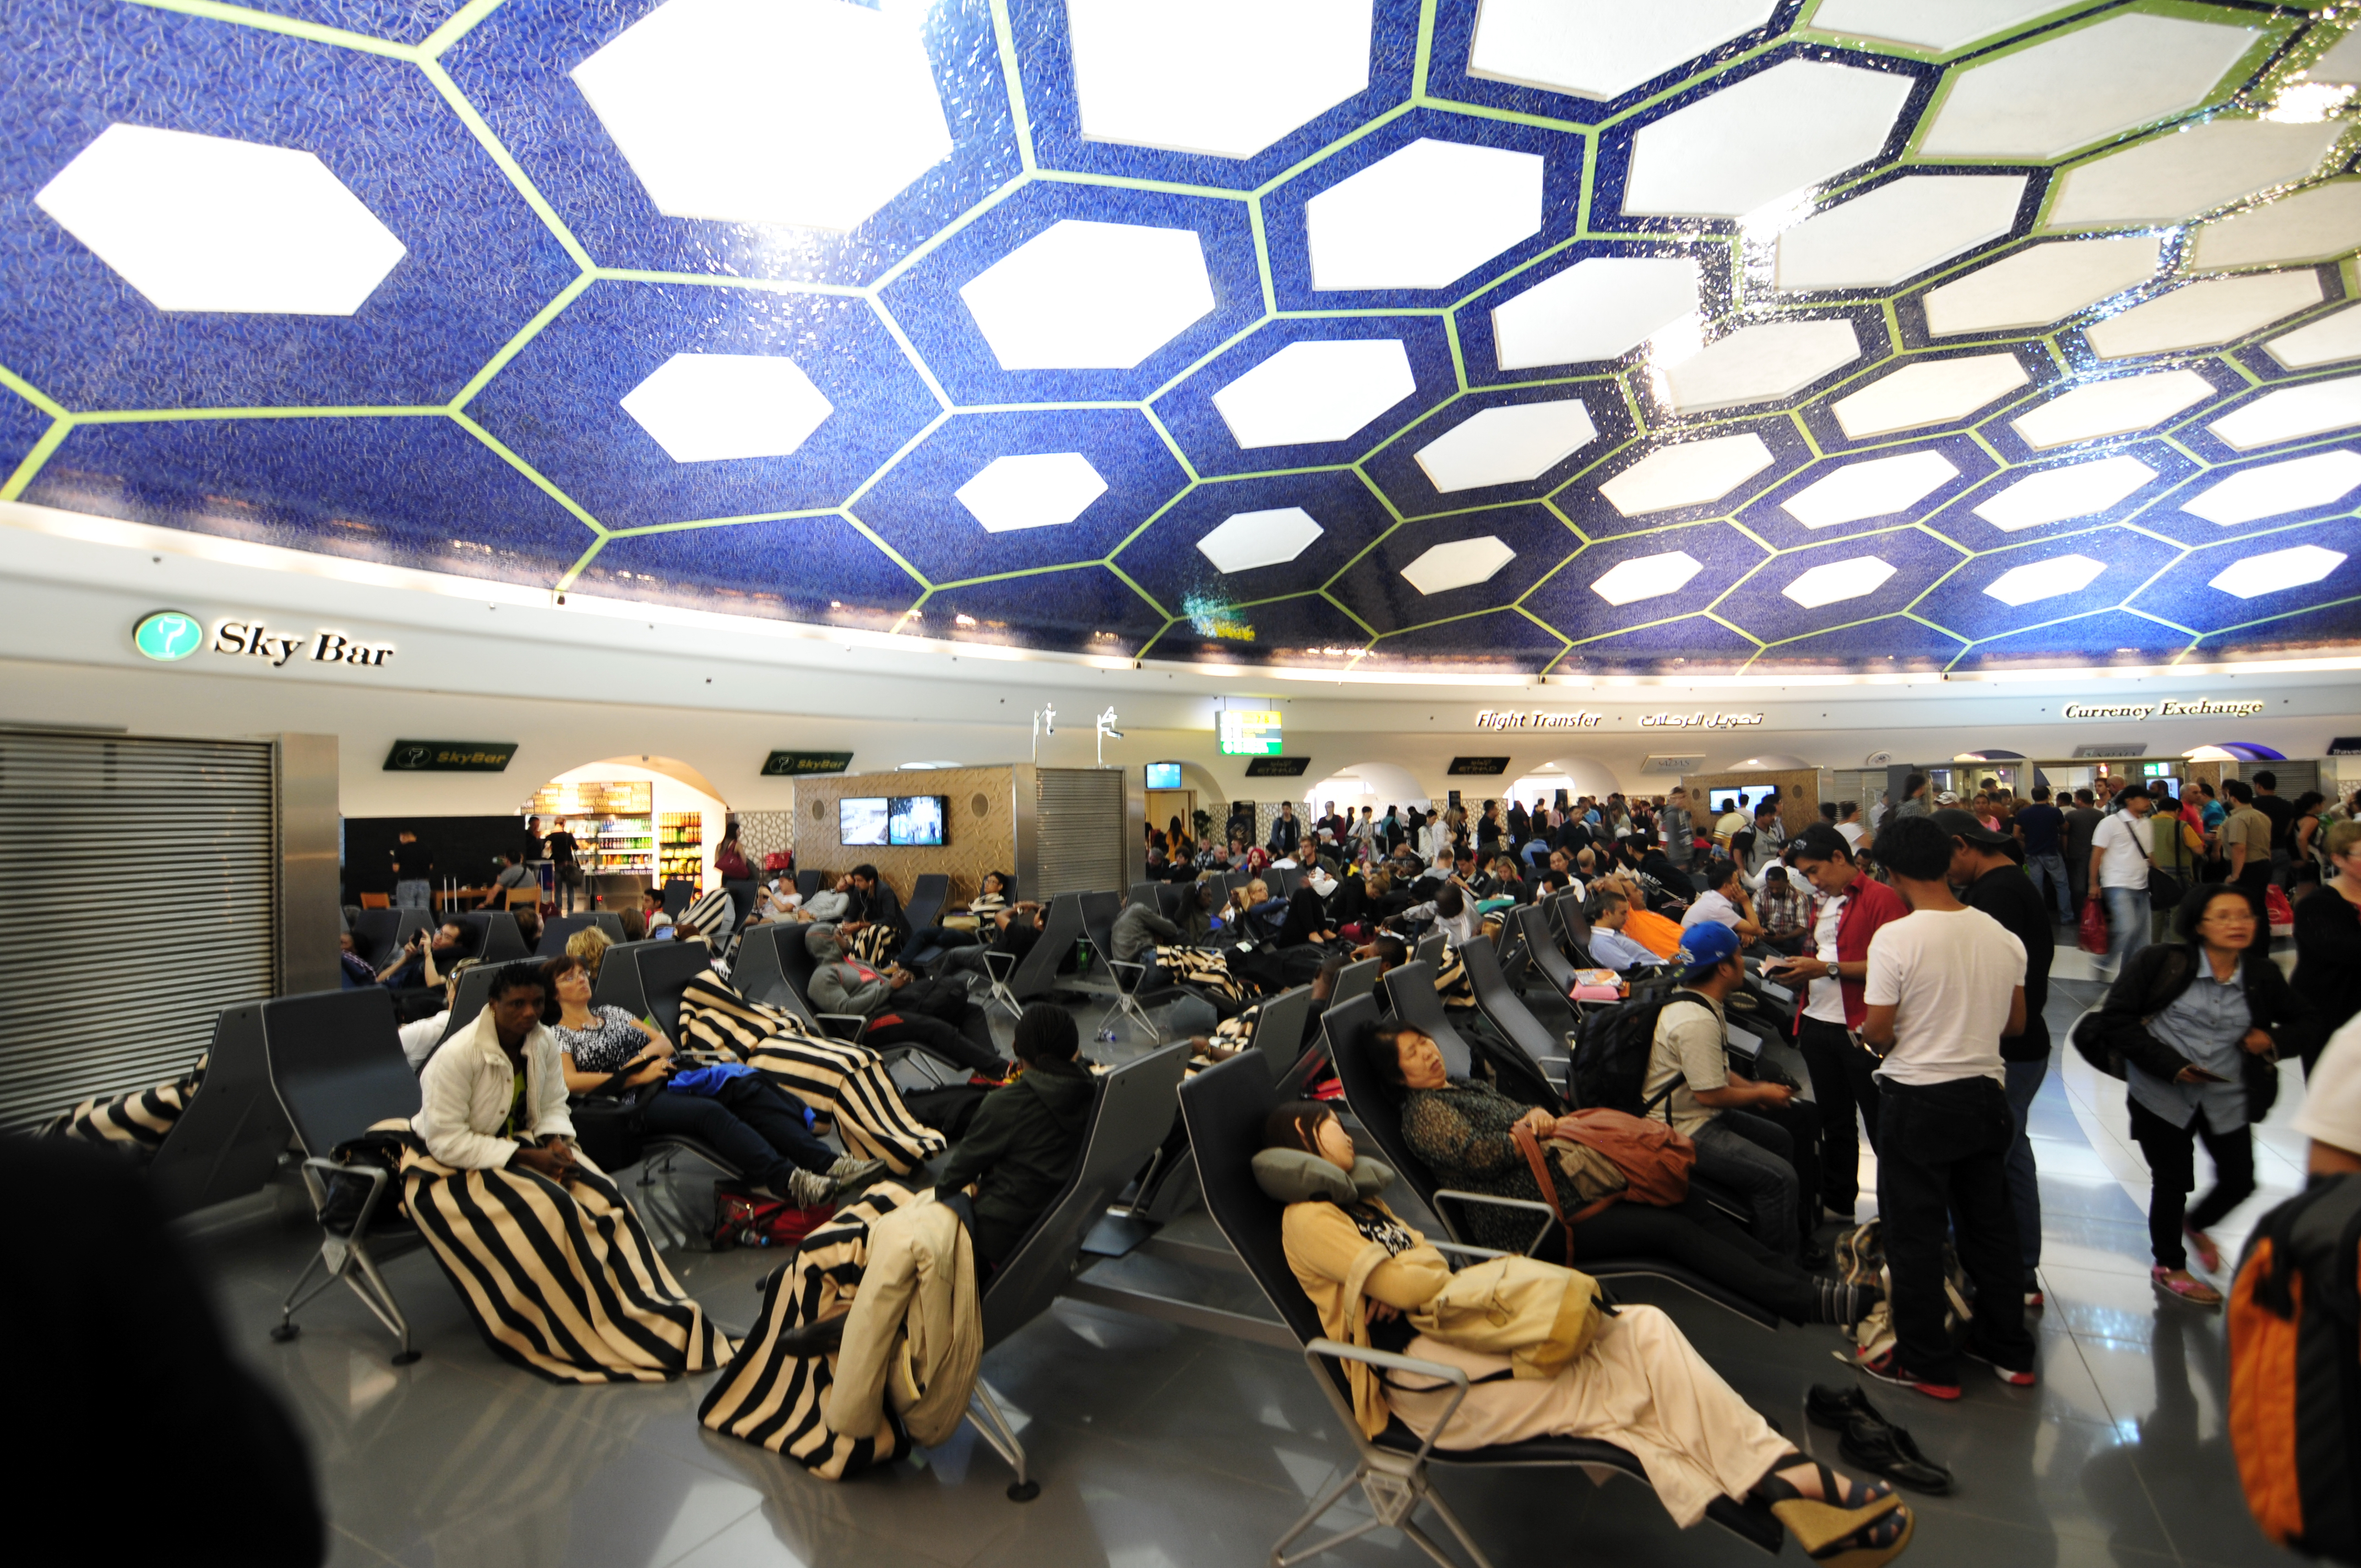 File 13 08 06 abu dhabi airport wikimedia commons for International decor company abu dhabi